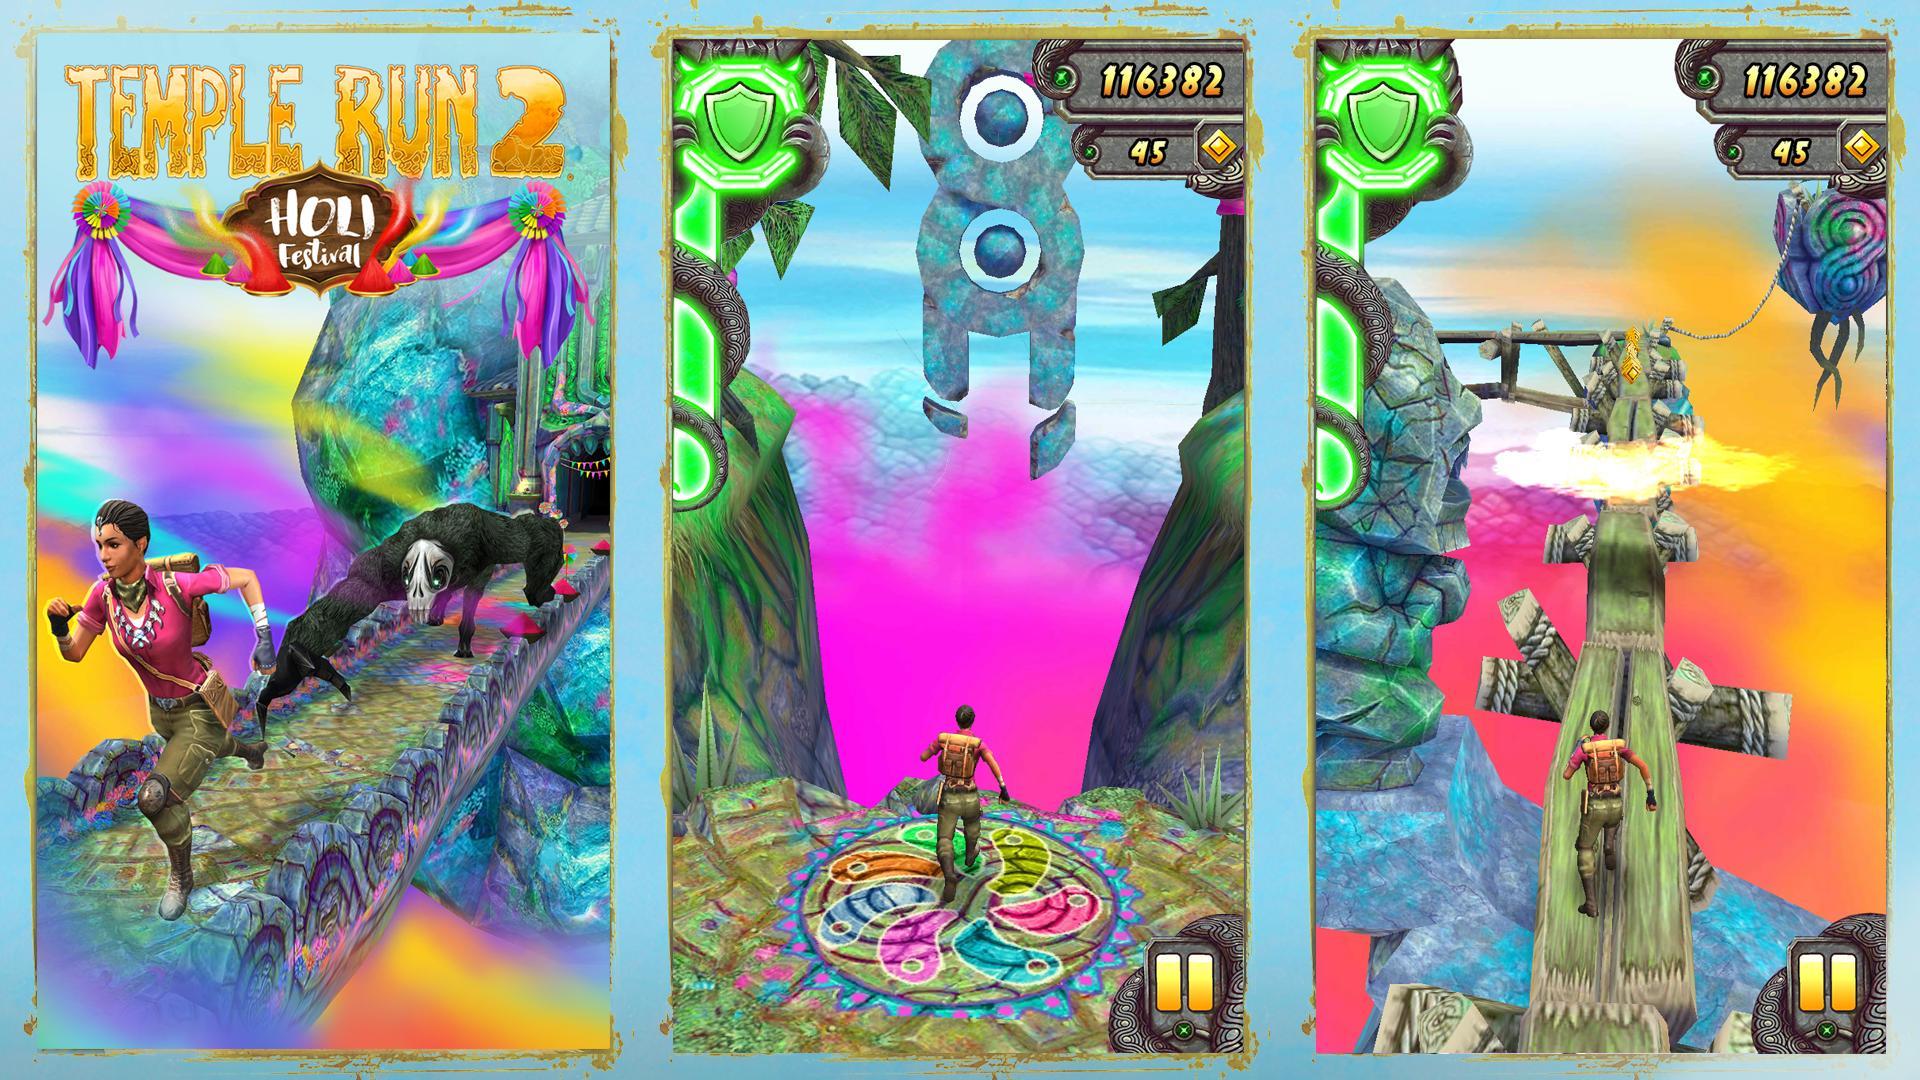 Temple Run 2 screenshot 1